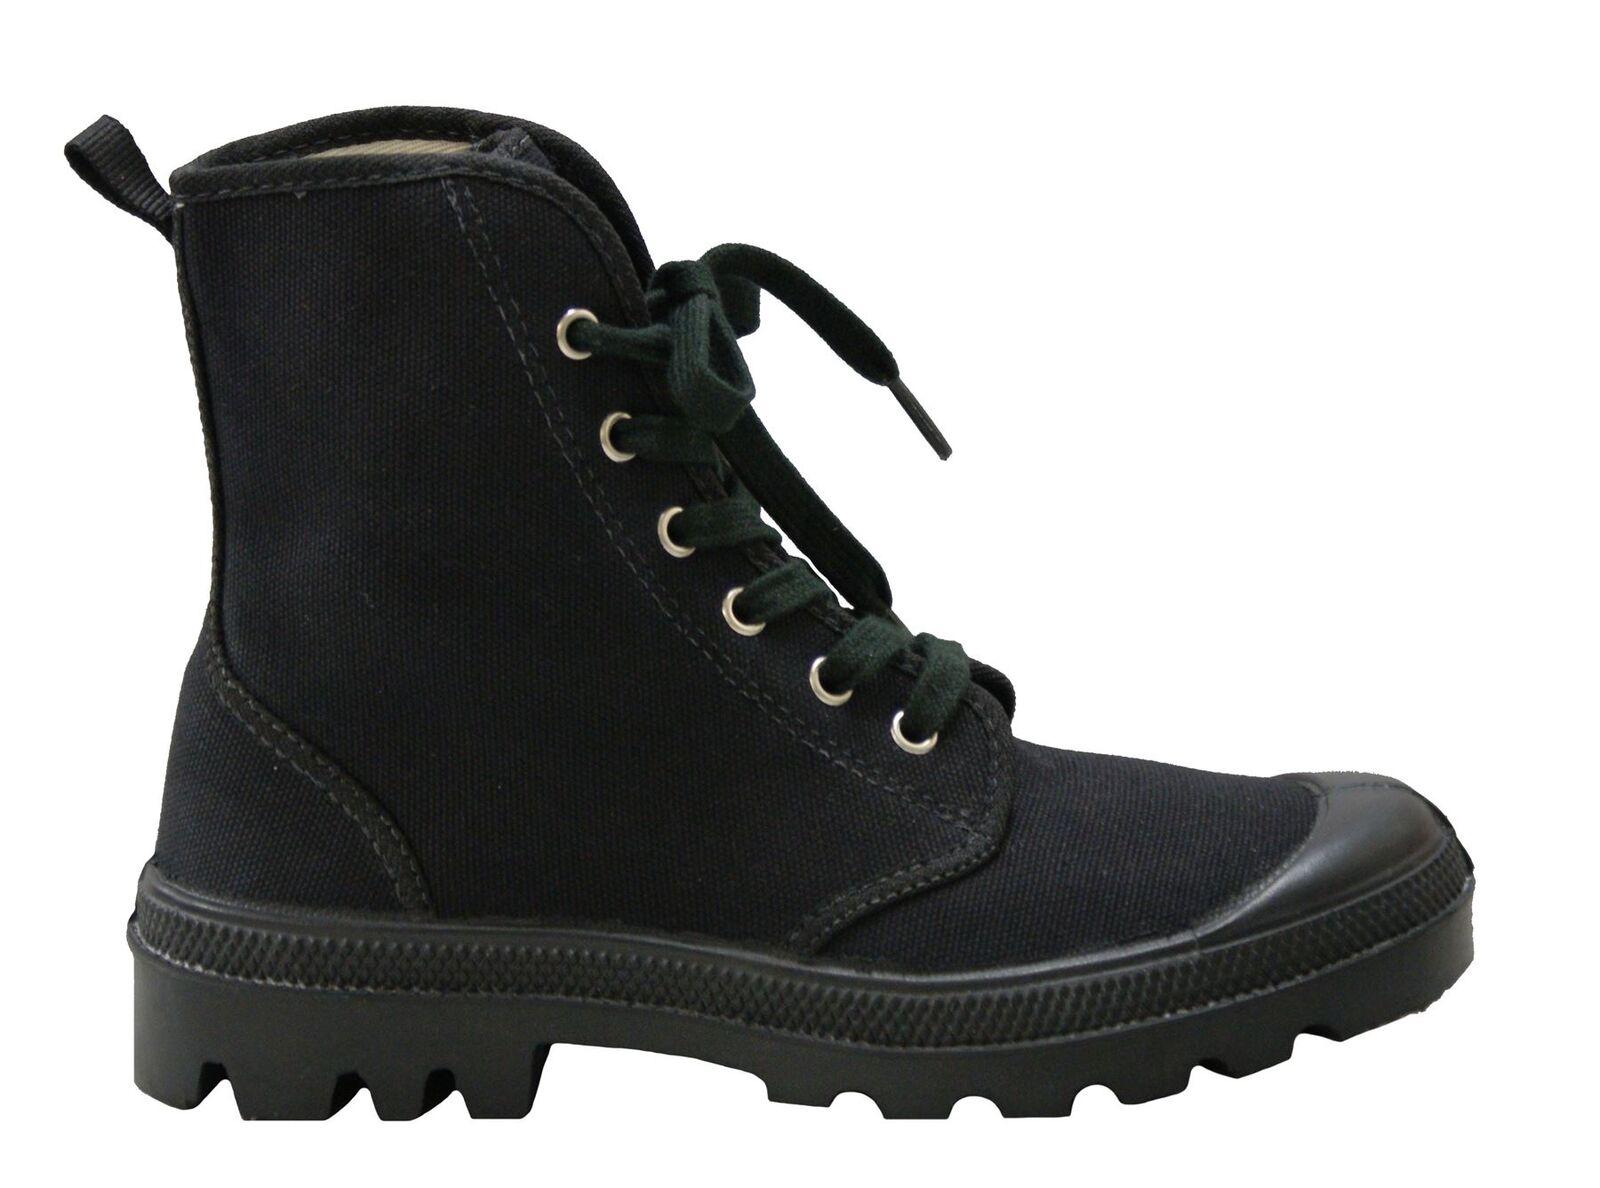 Palladium Style Unisex Footwear Fashionable Hi Top Pampa Canvas Boots